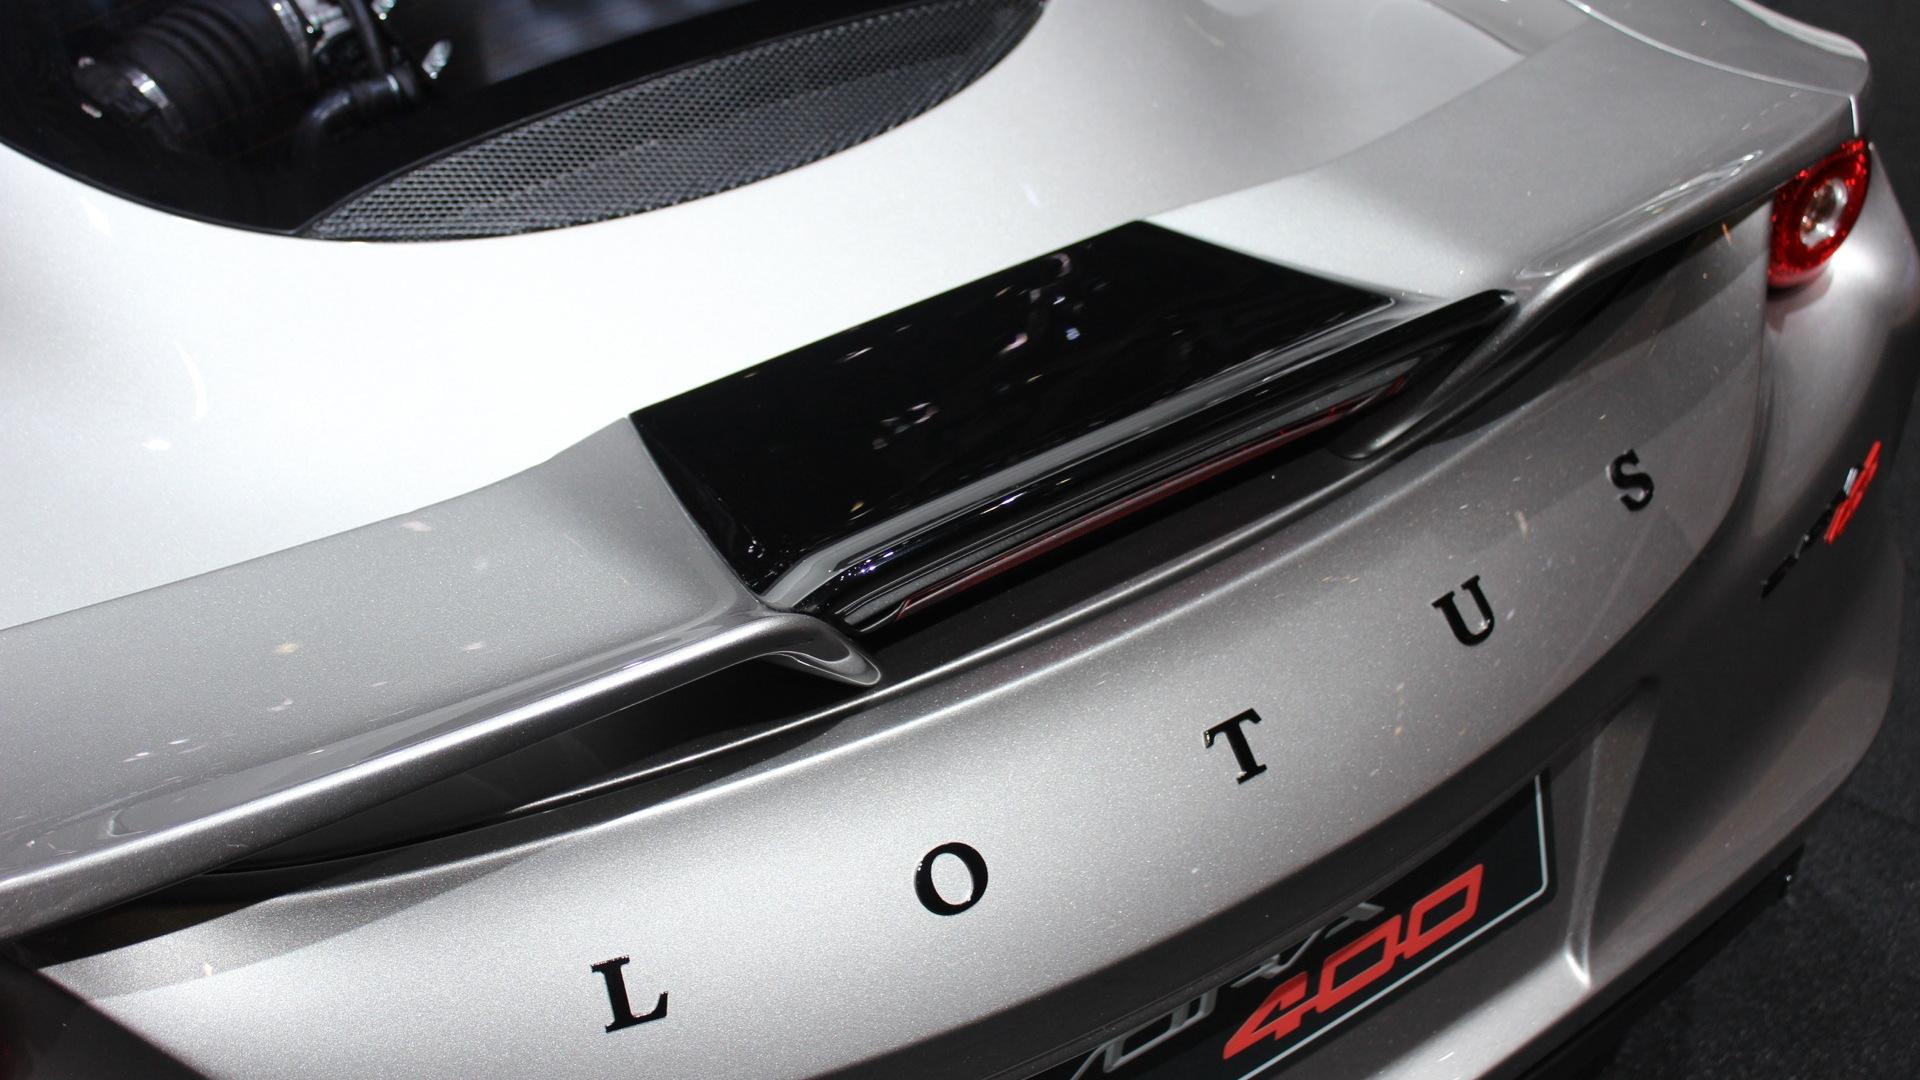 2017 Lotus Evora 400, 2015 Geneva Motor Show